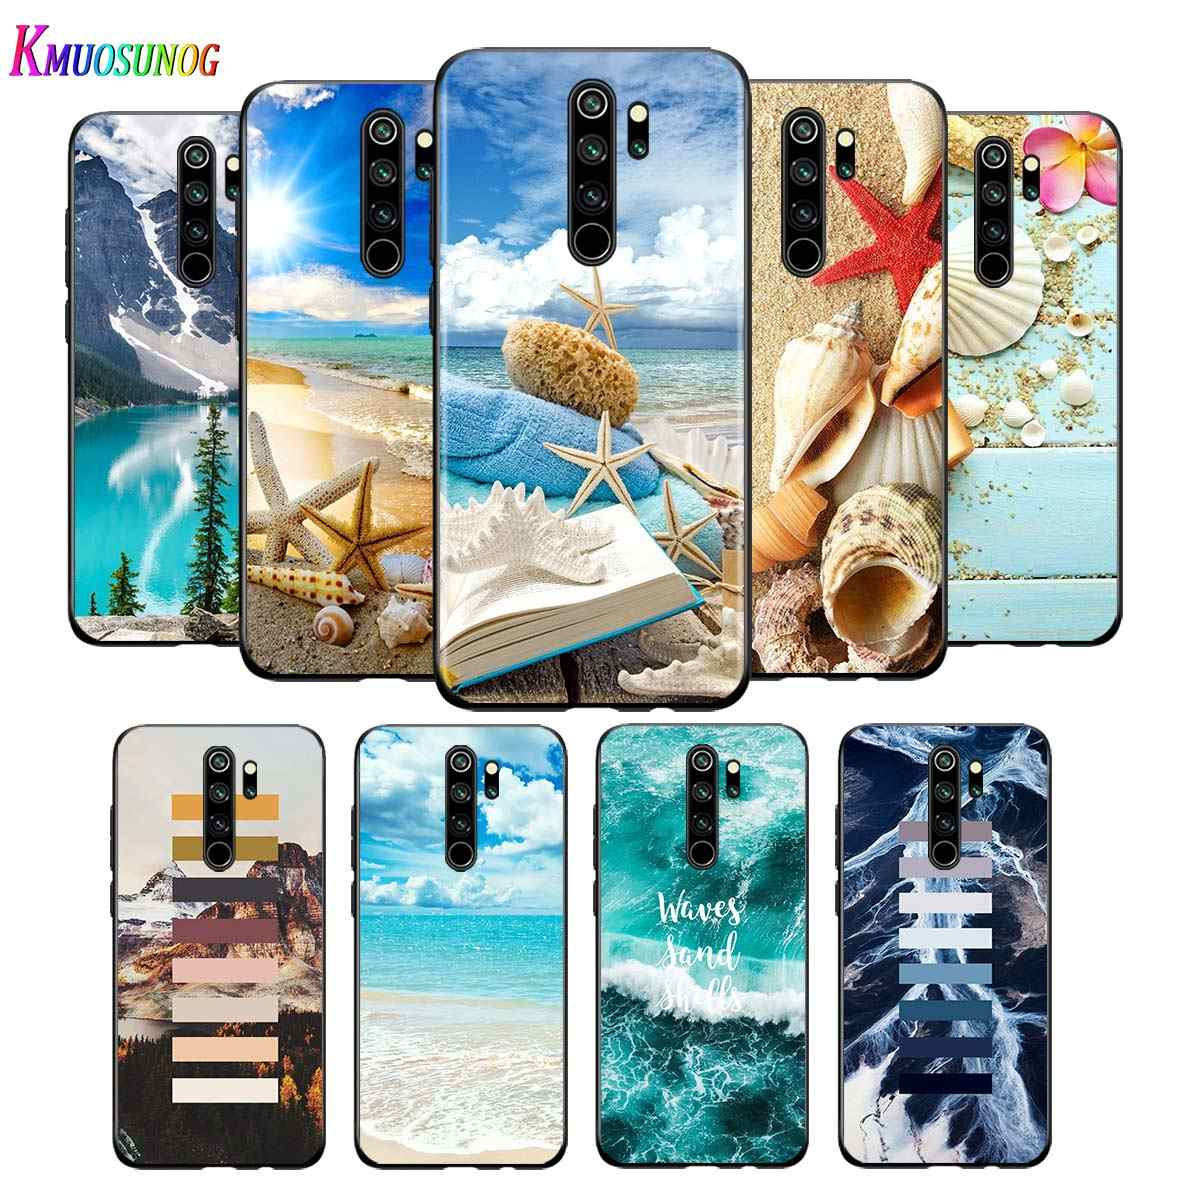 For Xiaomi Redmi Note 9 9S Max Phone Case Clear Sea Sky Sandy beach Back For Xiaomi 8T 8 7 6 5 Pro 5A 4X 4 Black Phone Cover